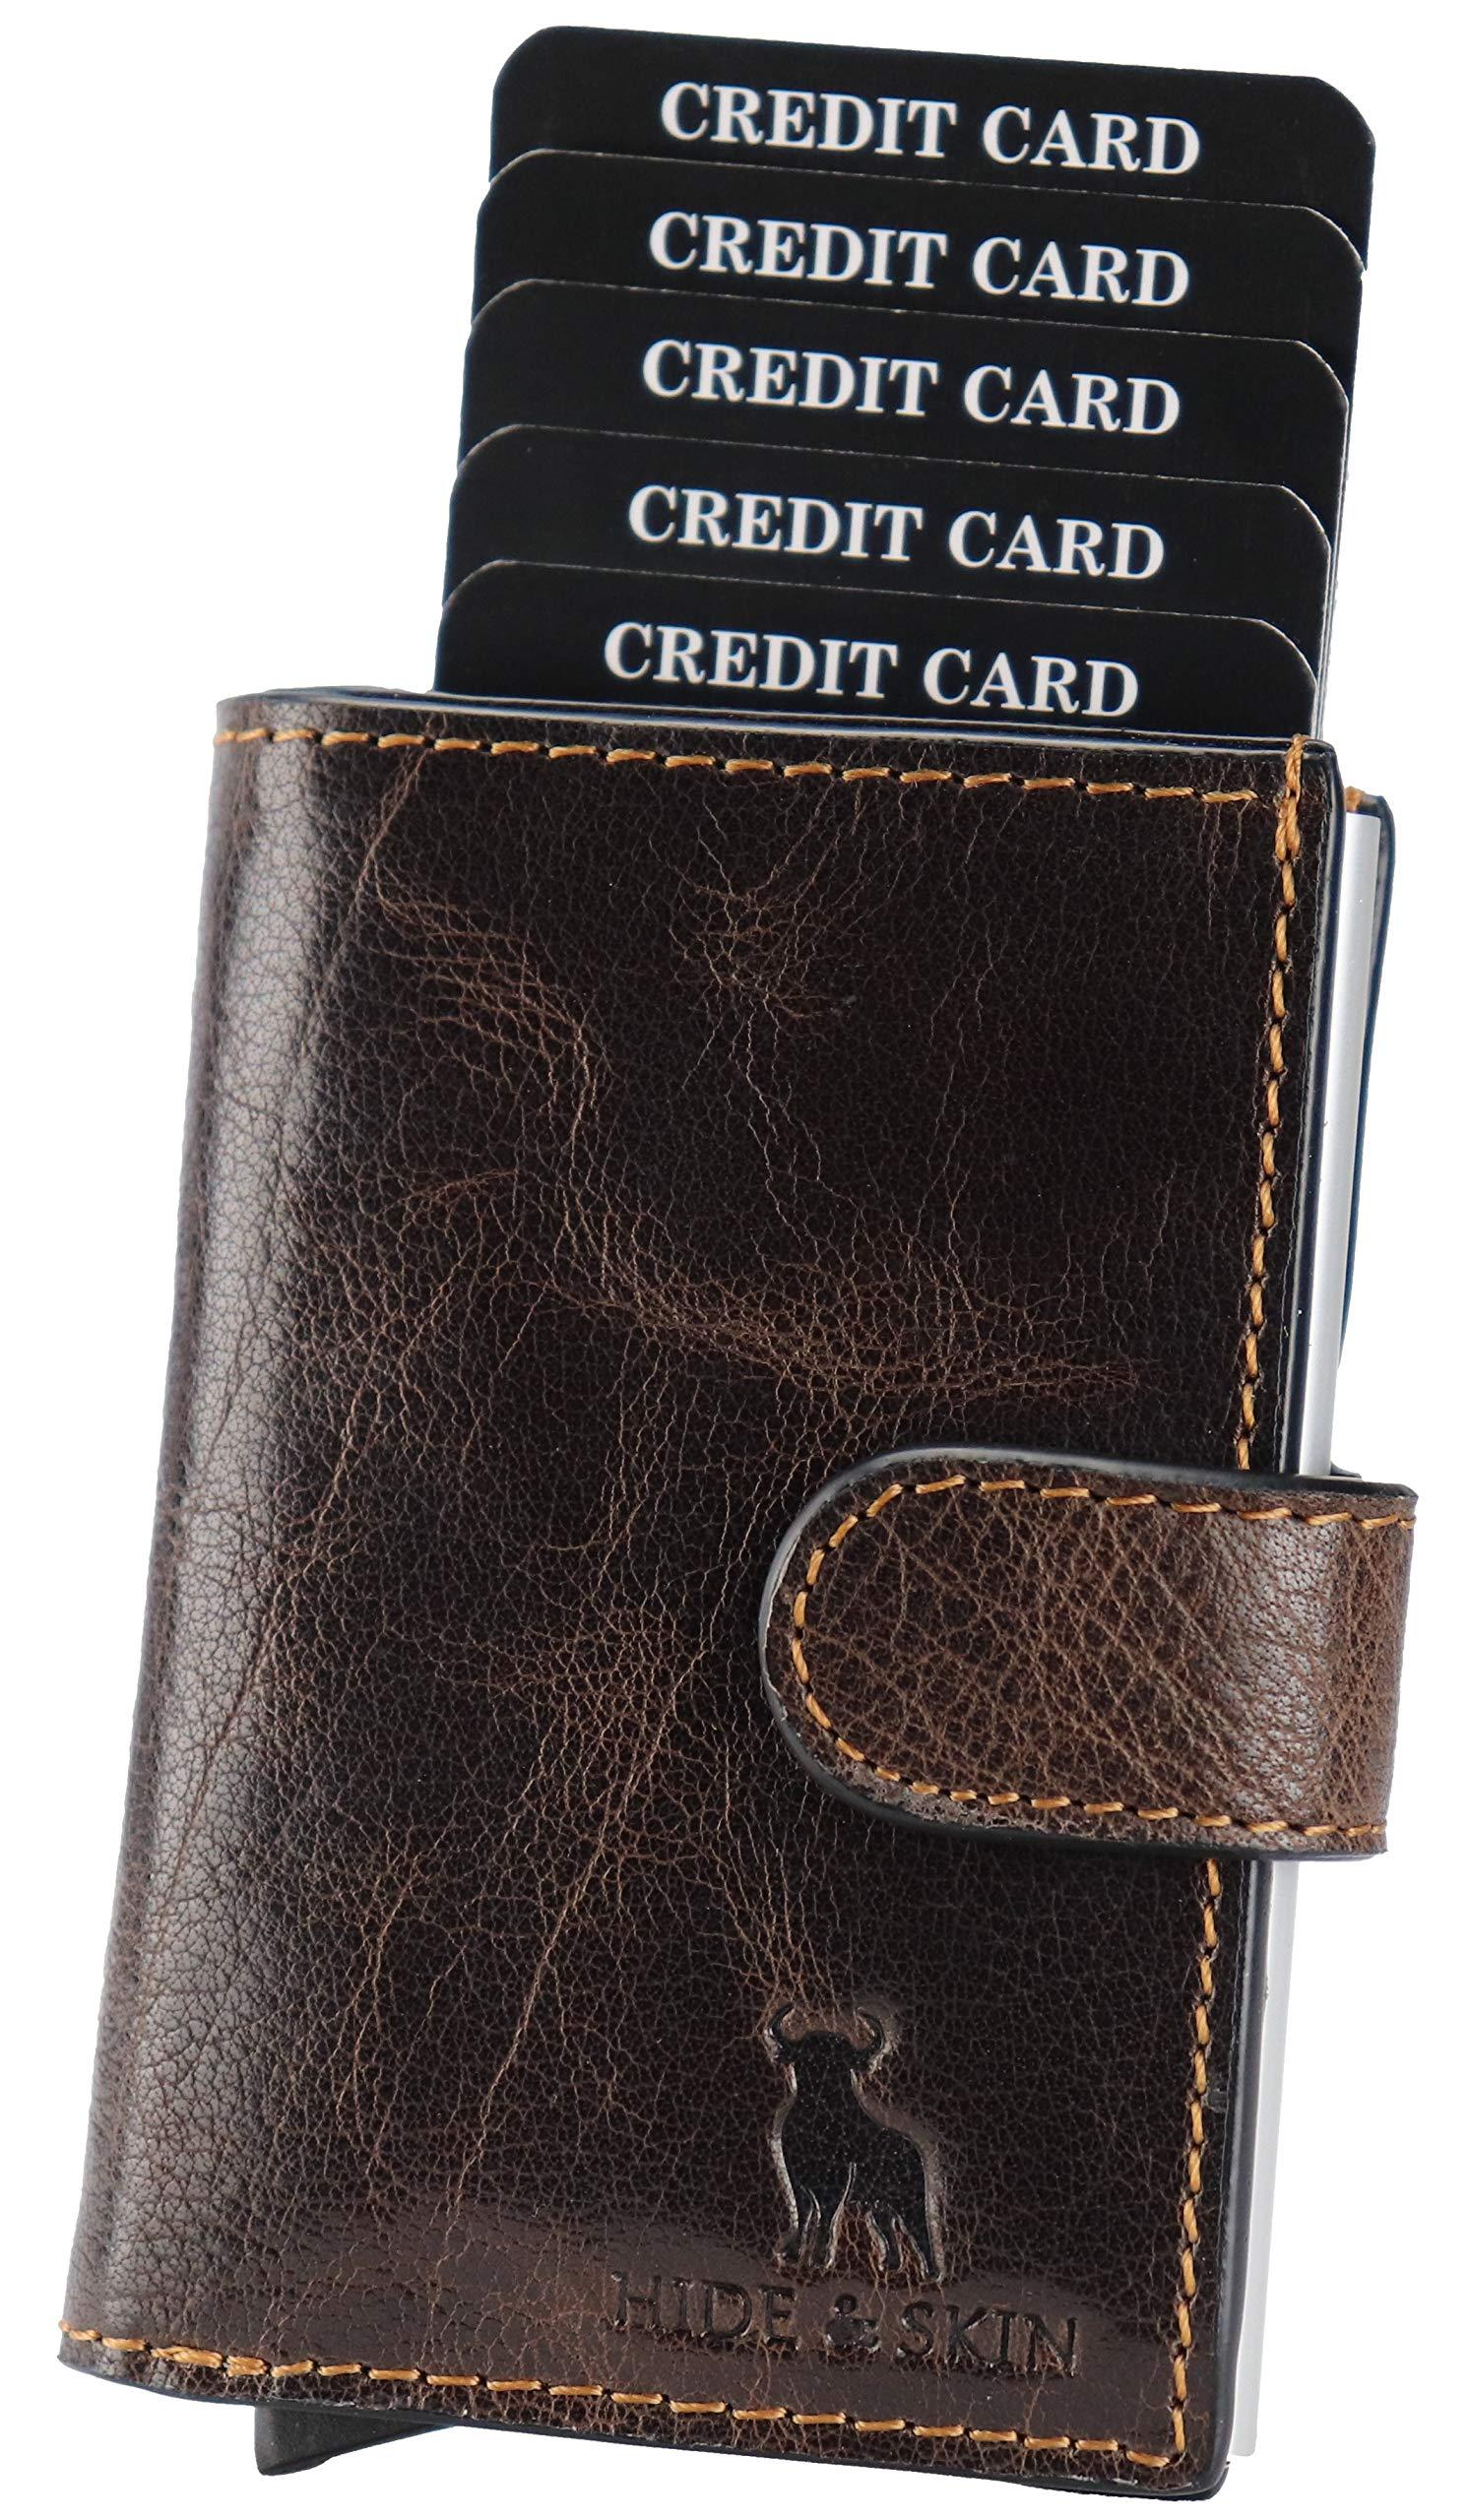 HIDE & SKIN Unisex Leather RFID Blocking Card Holder Cum Minimalistic Wallet